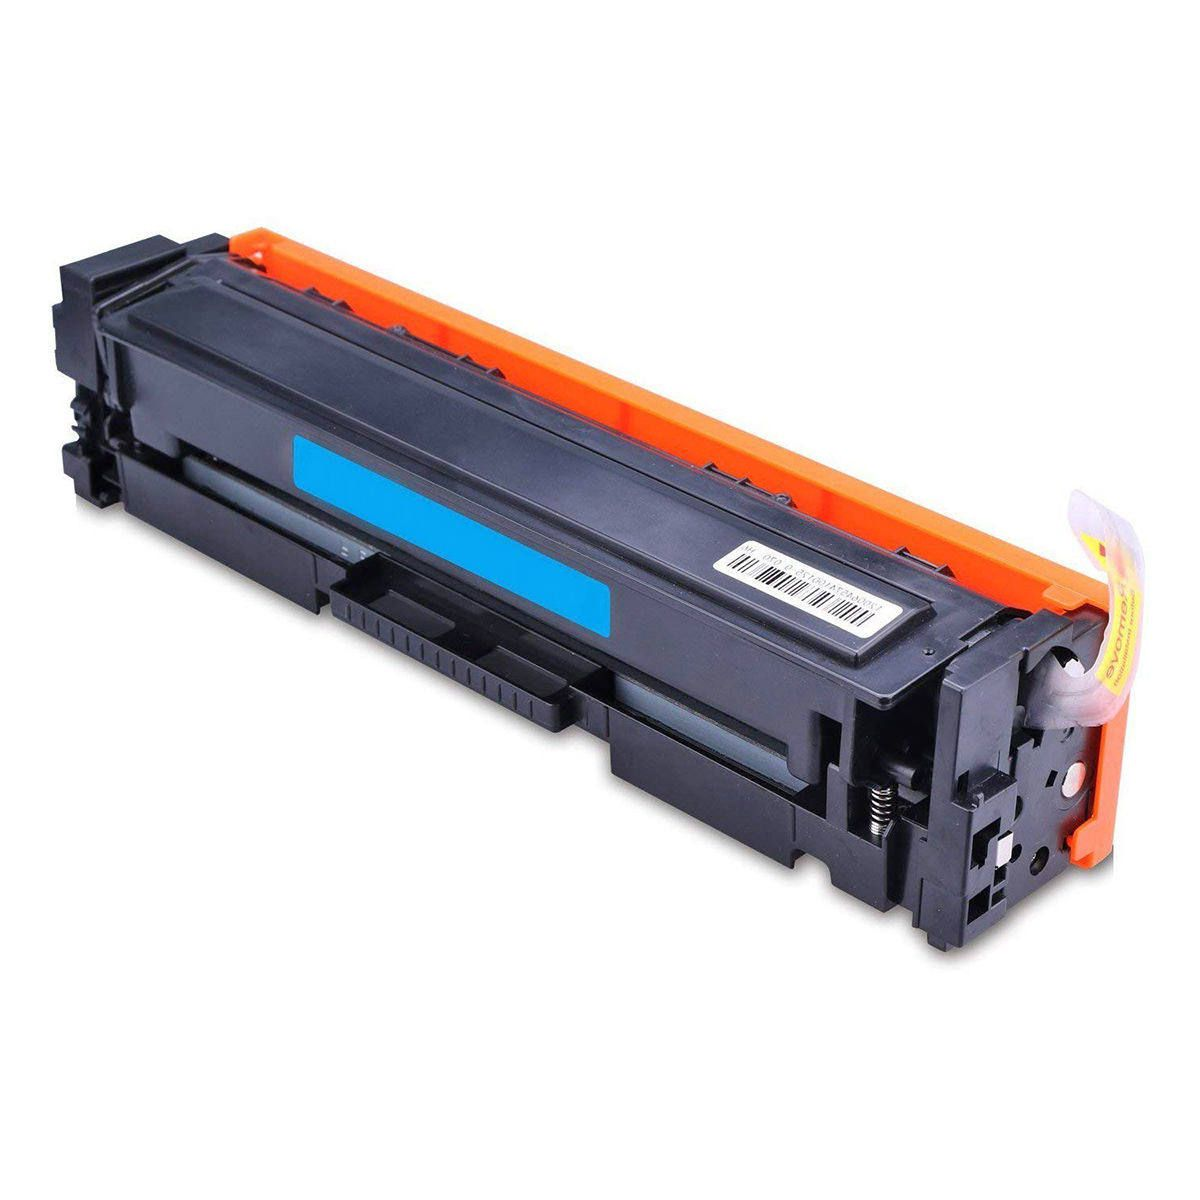 Compatível: Toner CF531A 205A para Impressora HP M180n M180nw M181fw M154a M154nw M180 M181 M154 / Ciano / 900